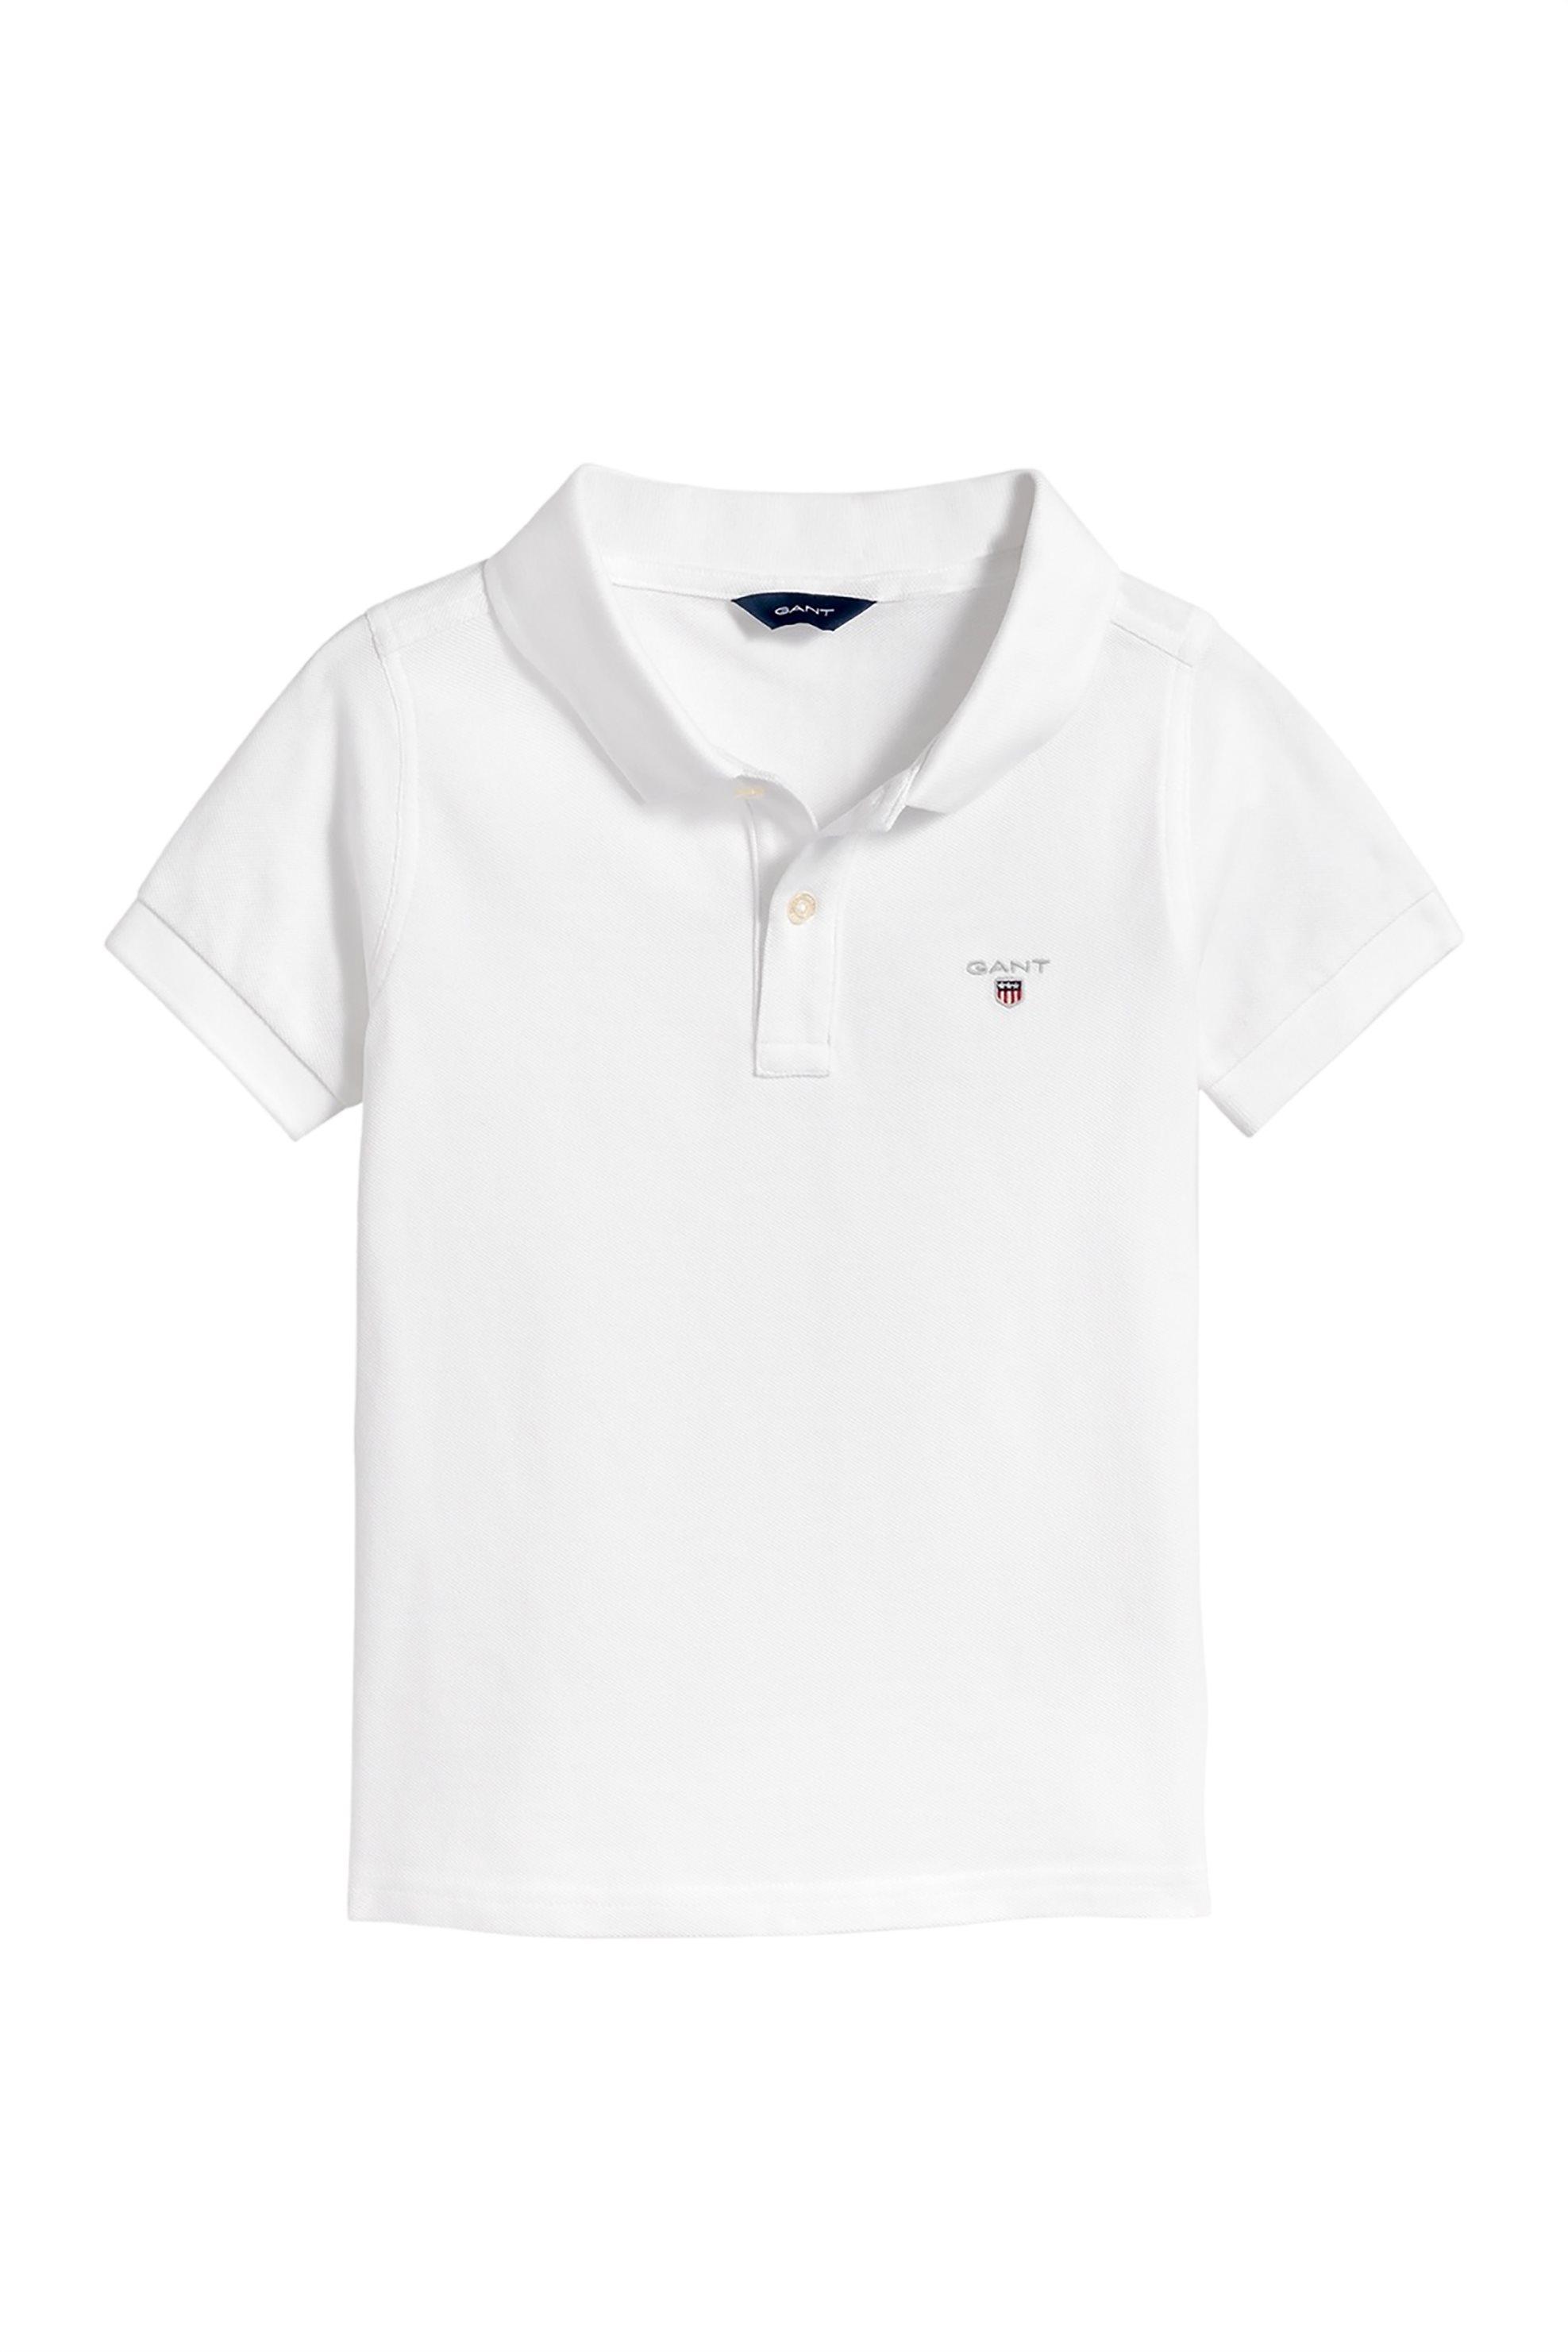 3c7a13ffbcee Notos Gant Παιδική μπλούζα polo με δίκουμπη πατιλέτα - 802201 - Λευκό